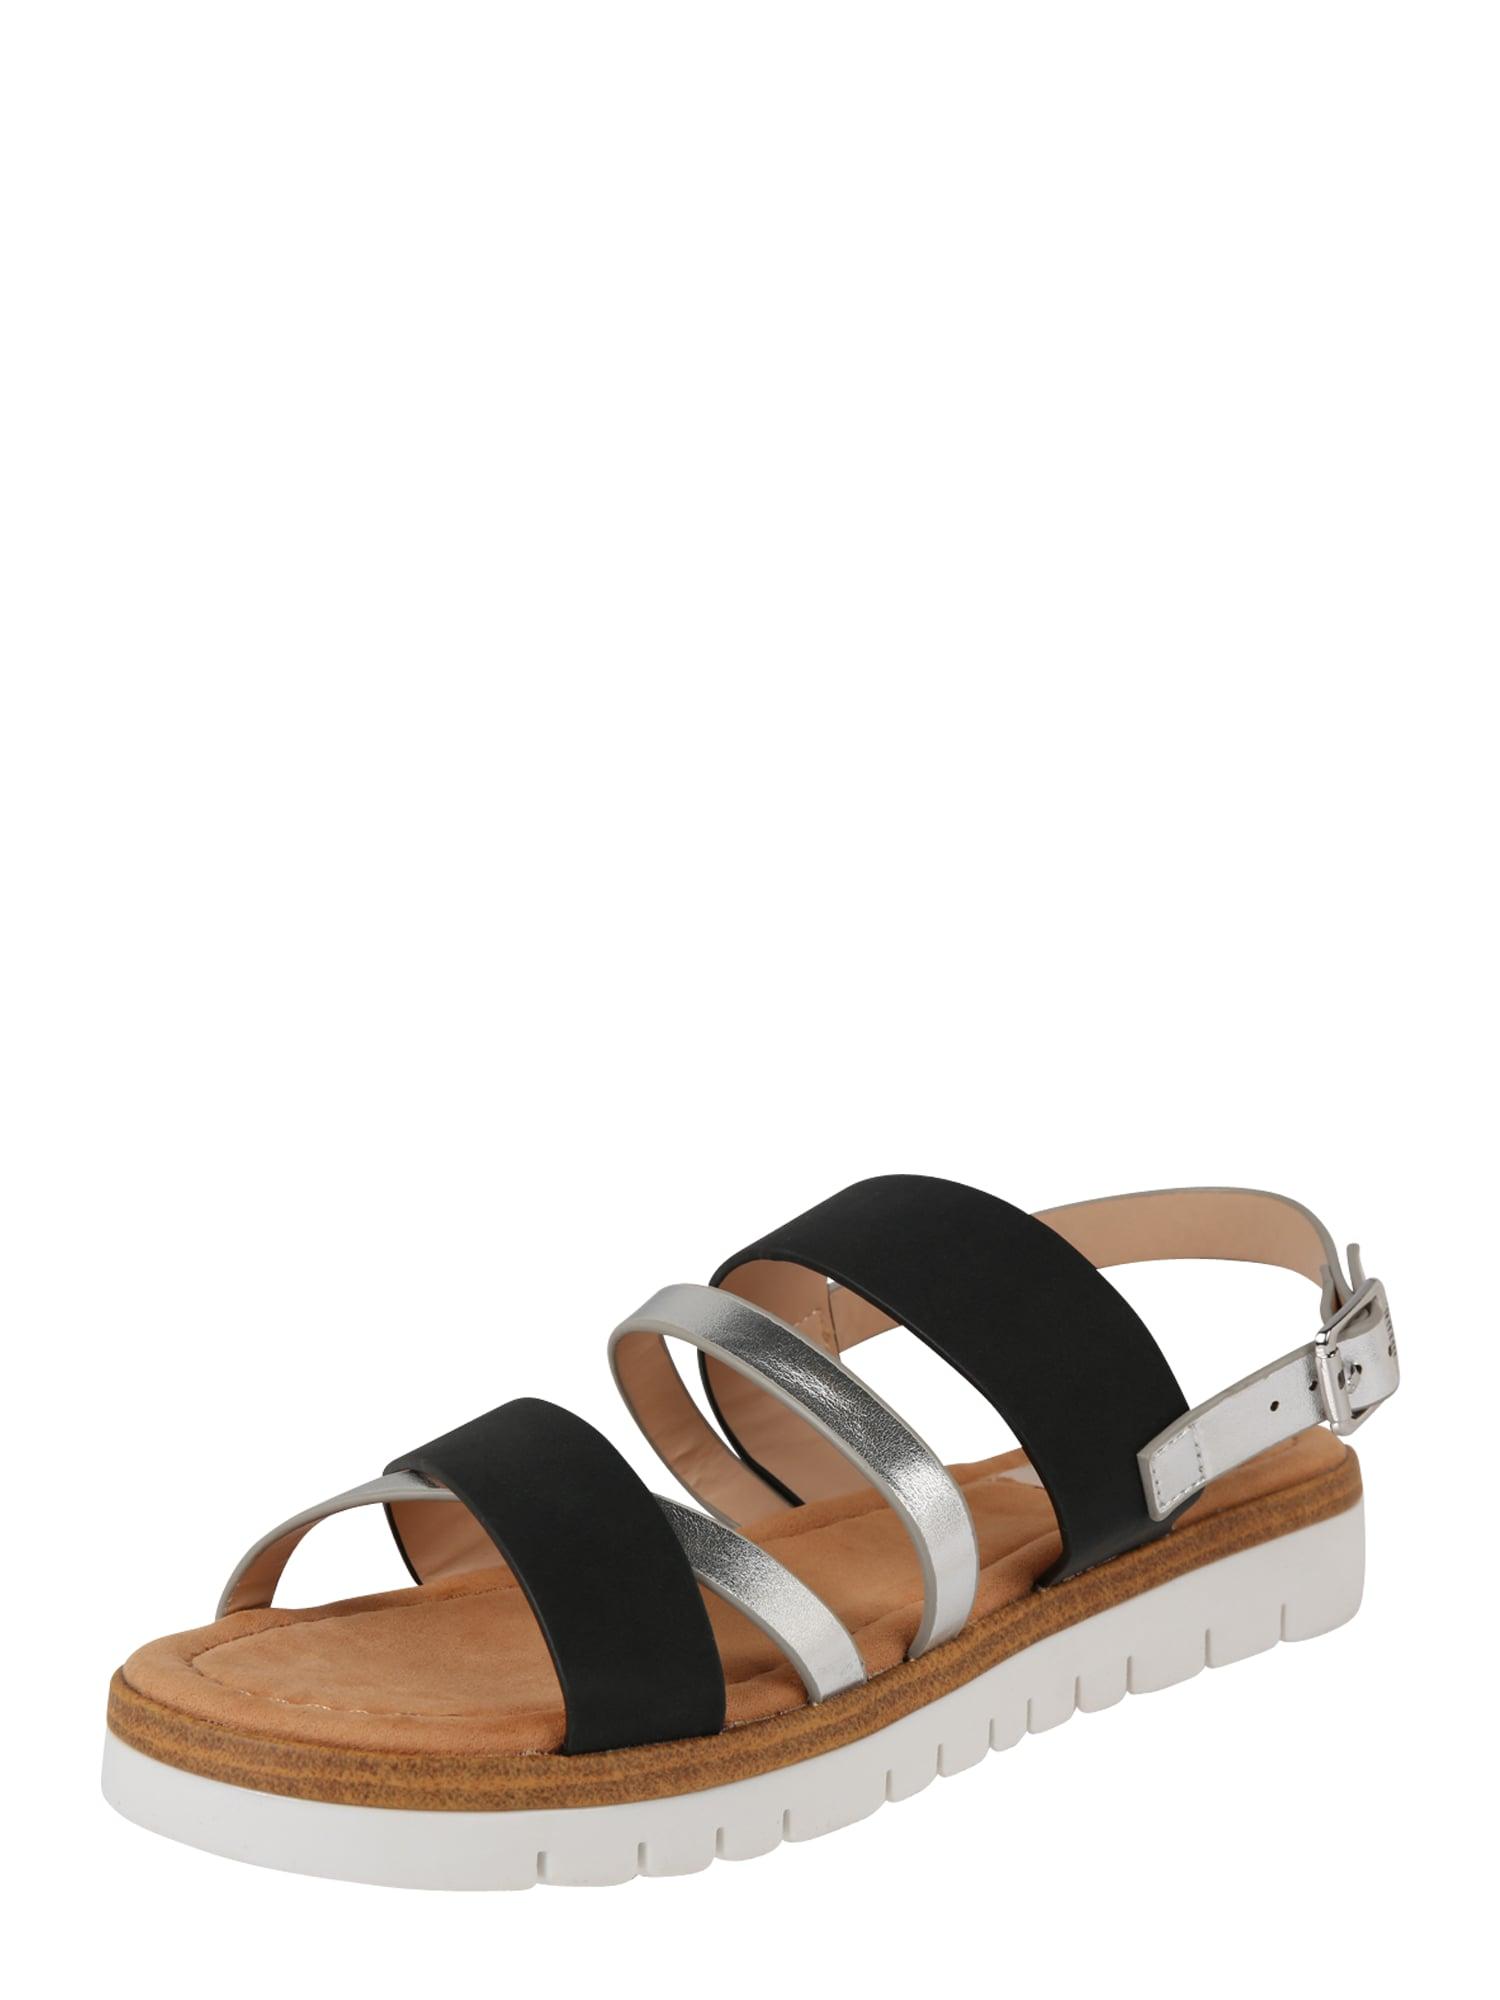 Sandály DAMA černá stříbrná MTNG